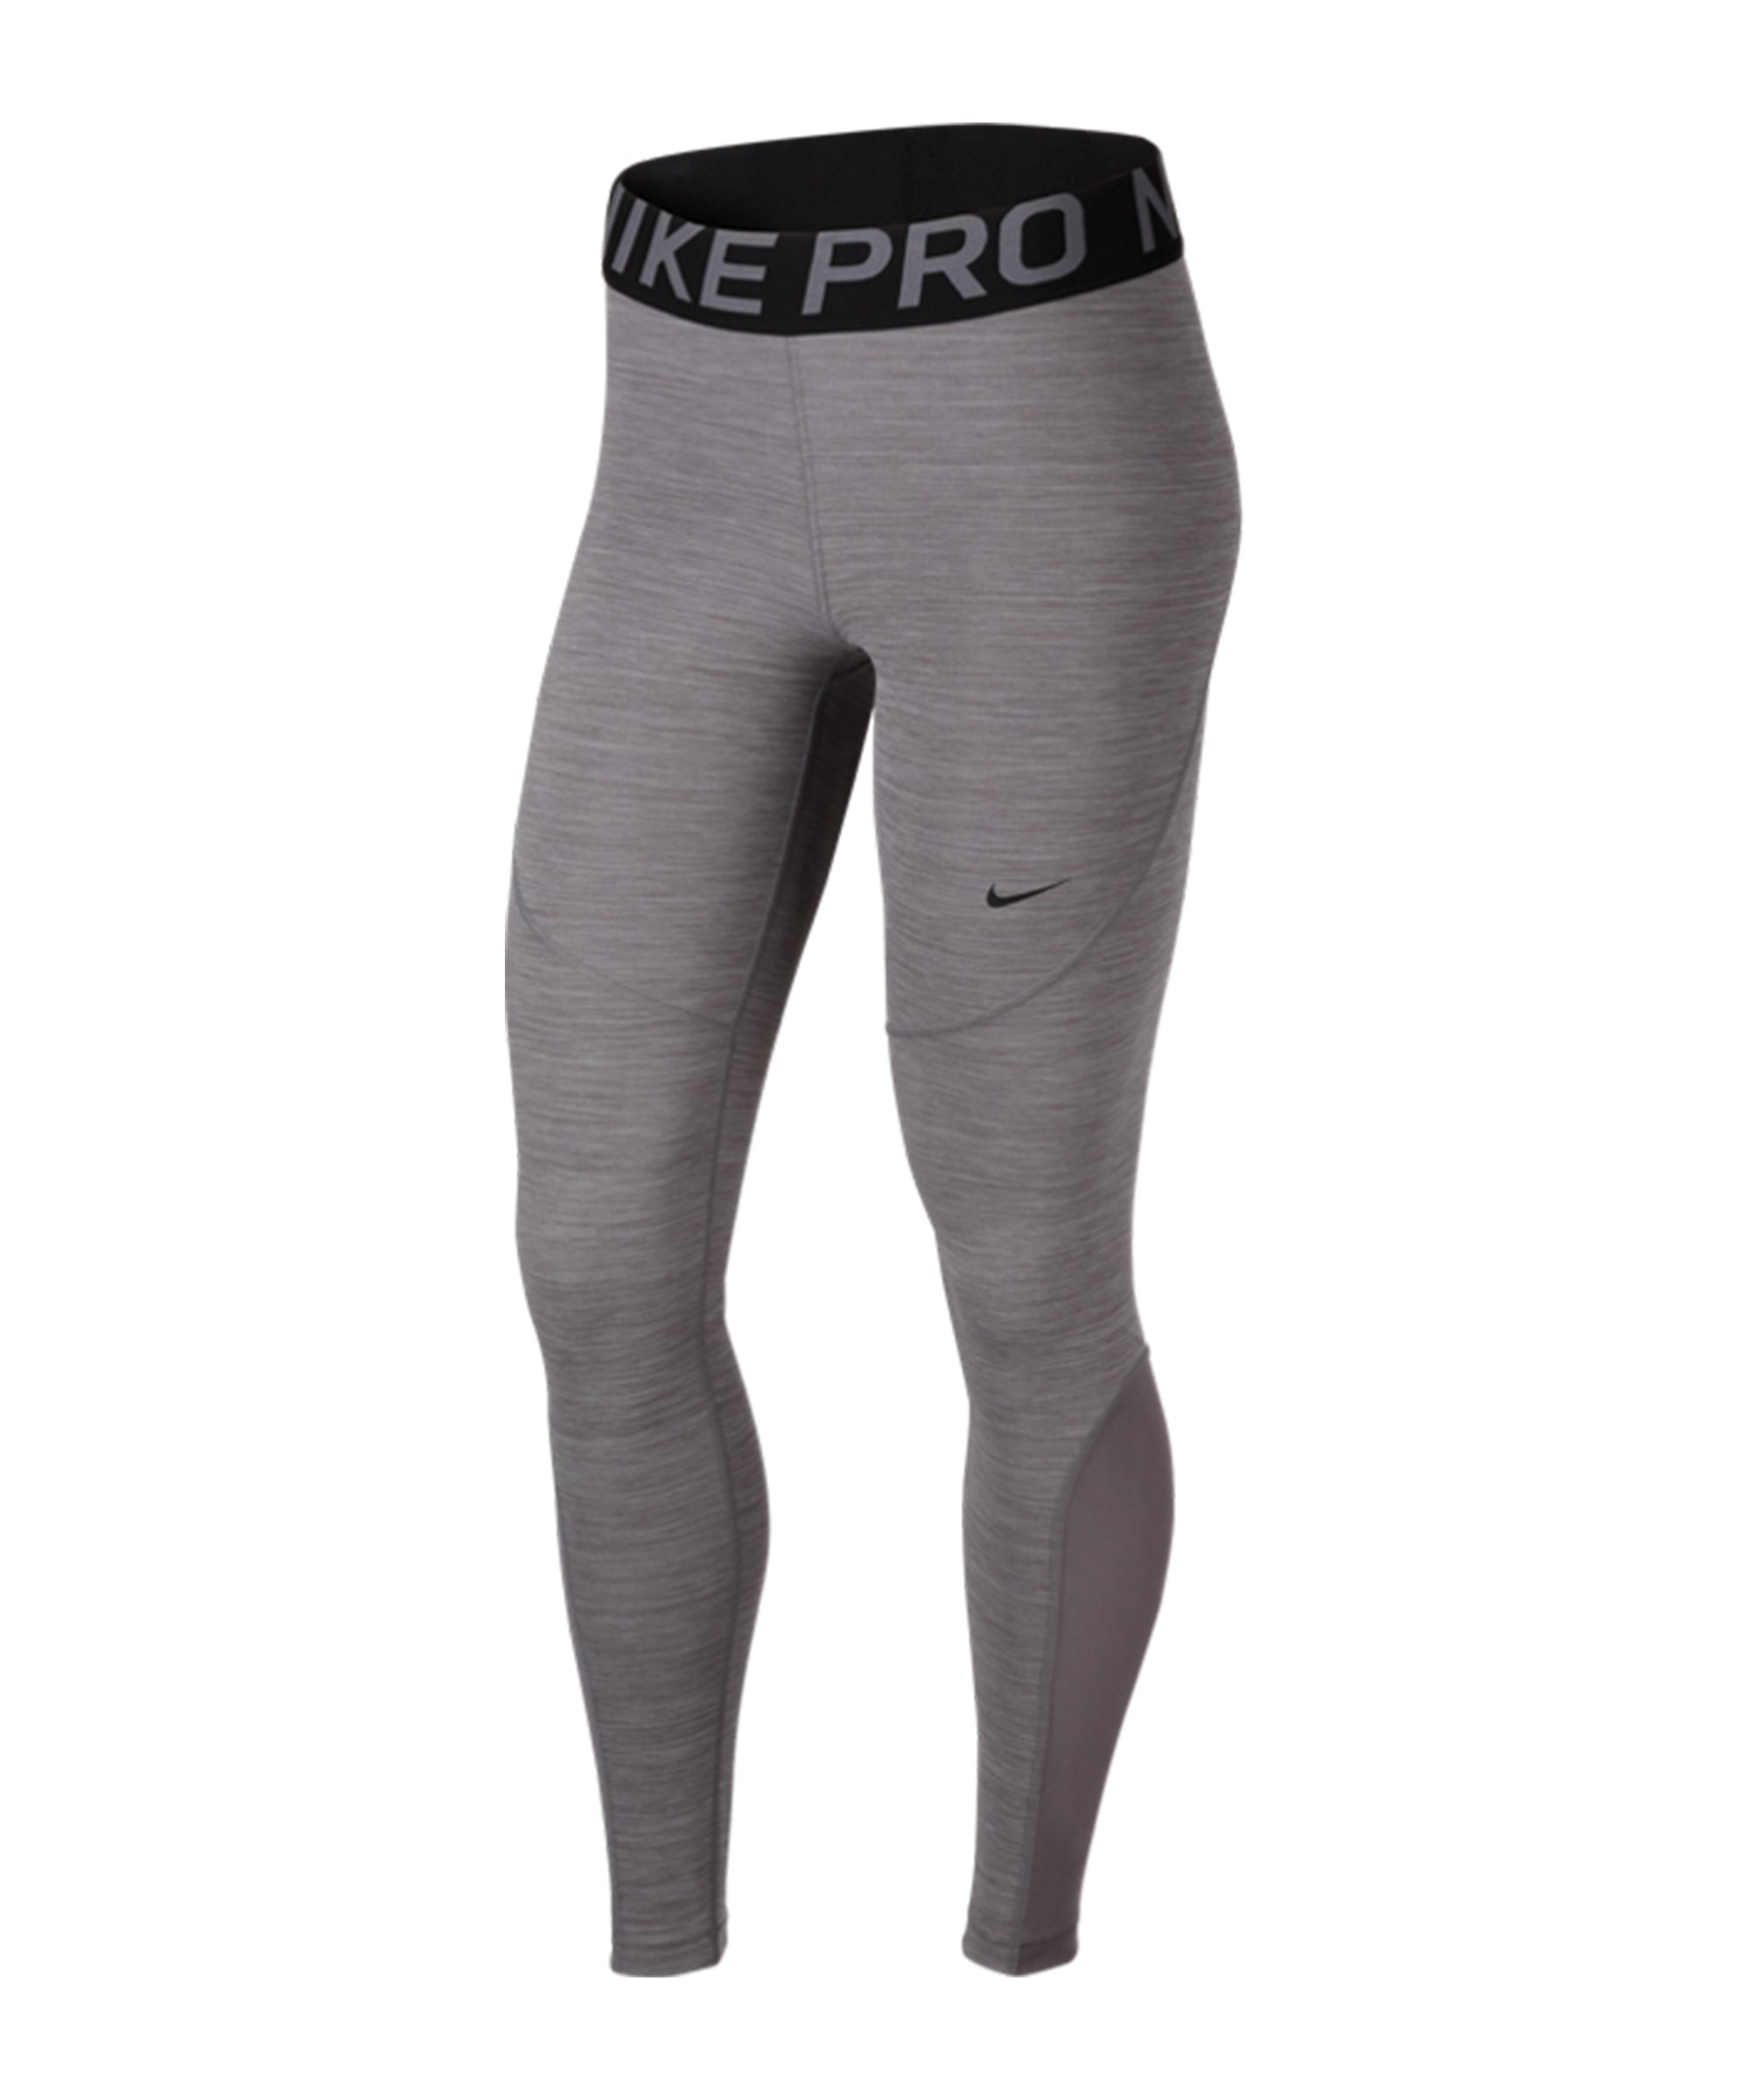 enemigo Pagar tributo perder  Nike Pro Tights Leggings Damen Grau Schwarz F063 - Sport-1a